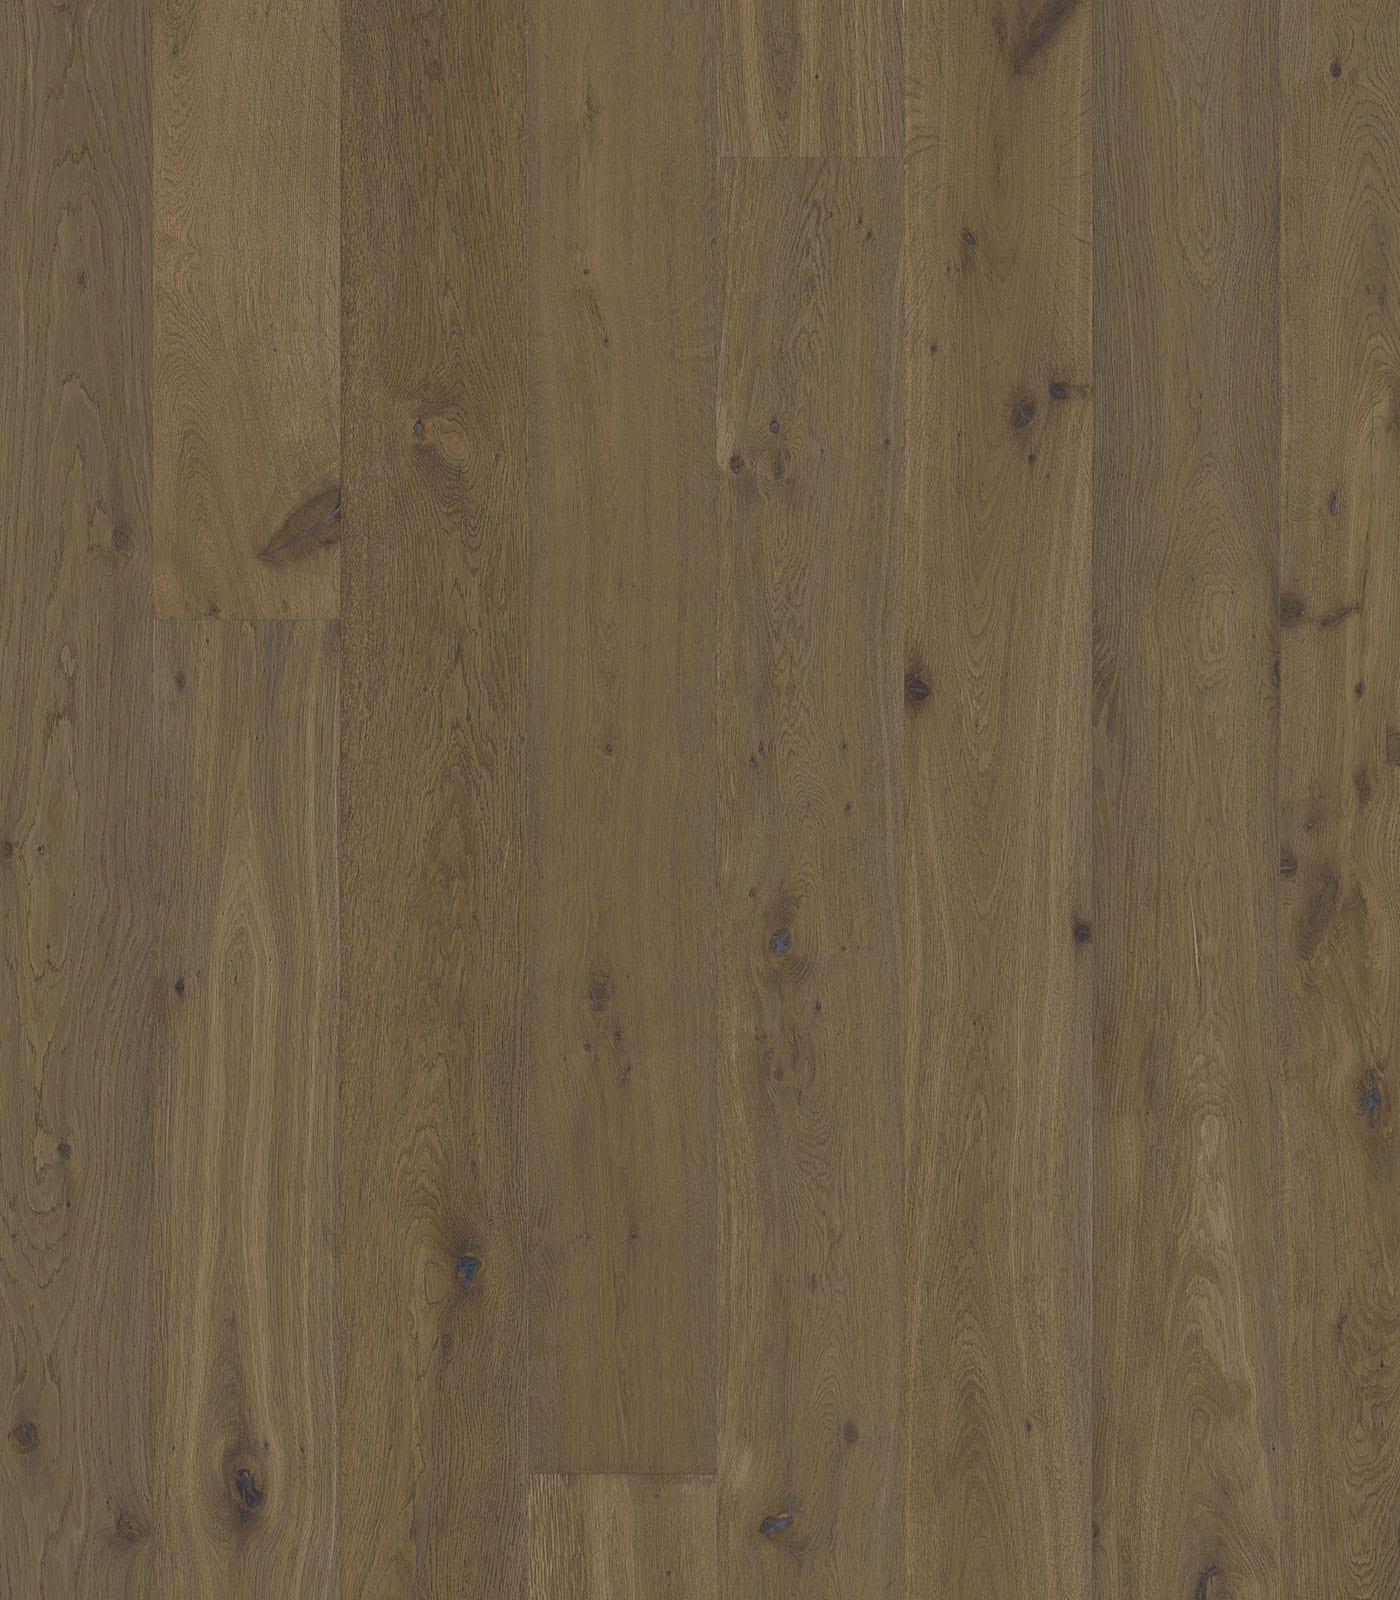 St Lucia-Euroepan Oak Floors-Lifestyle Collection-flat